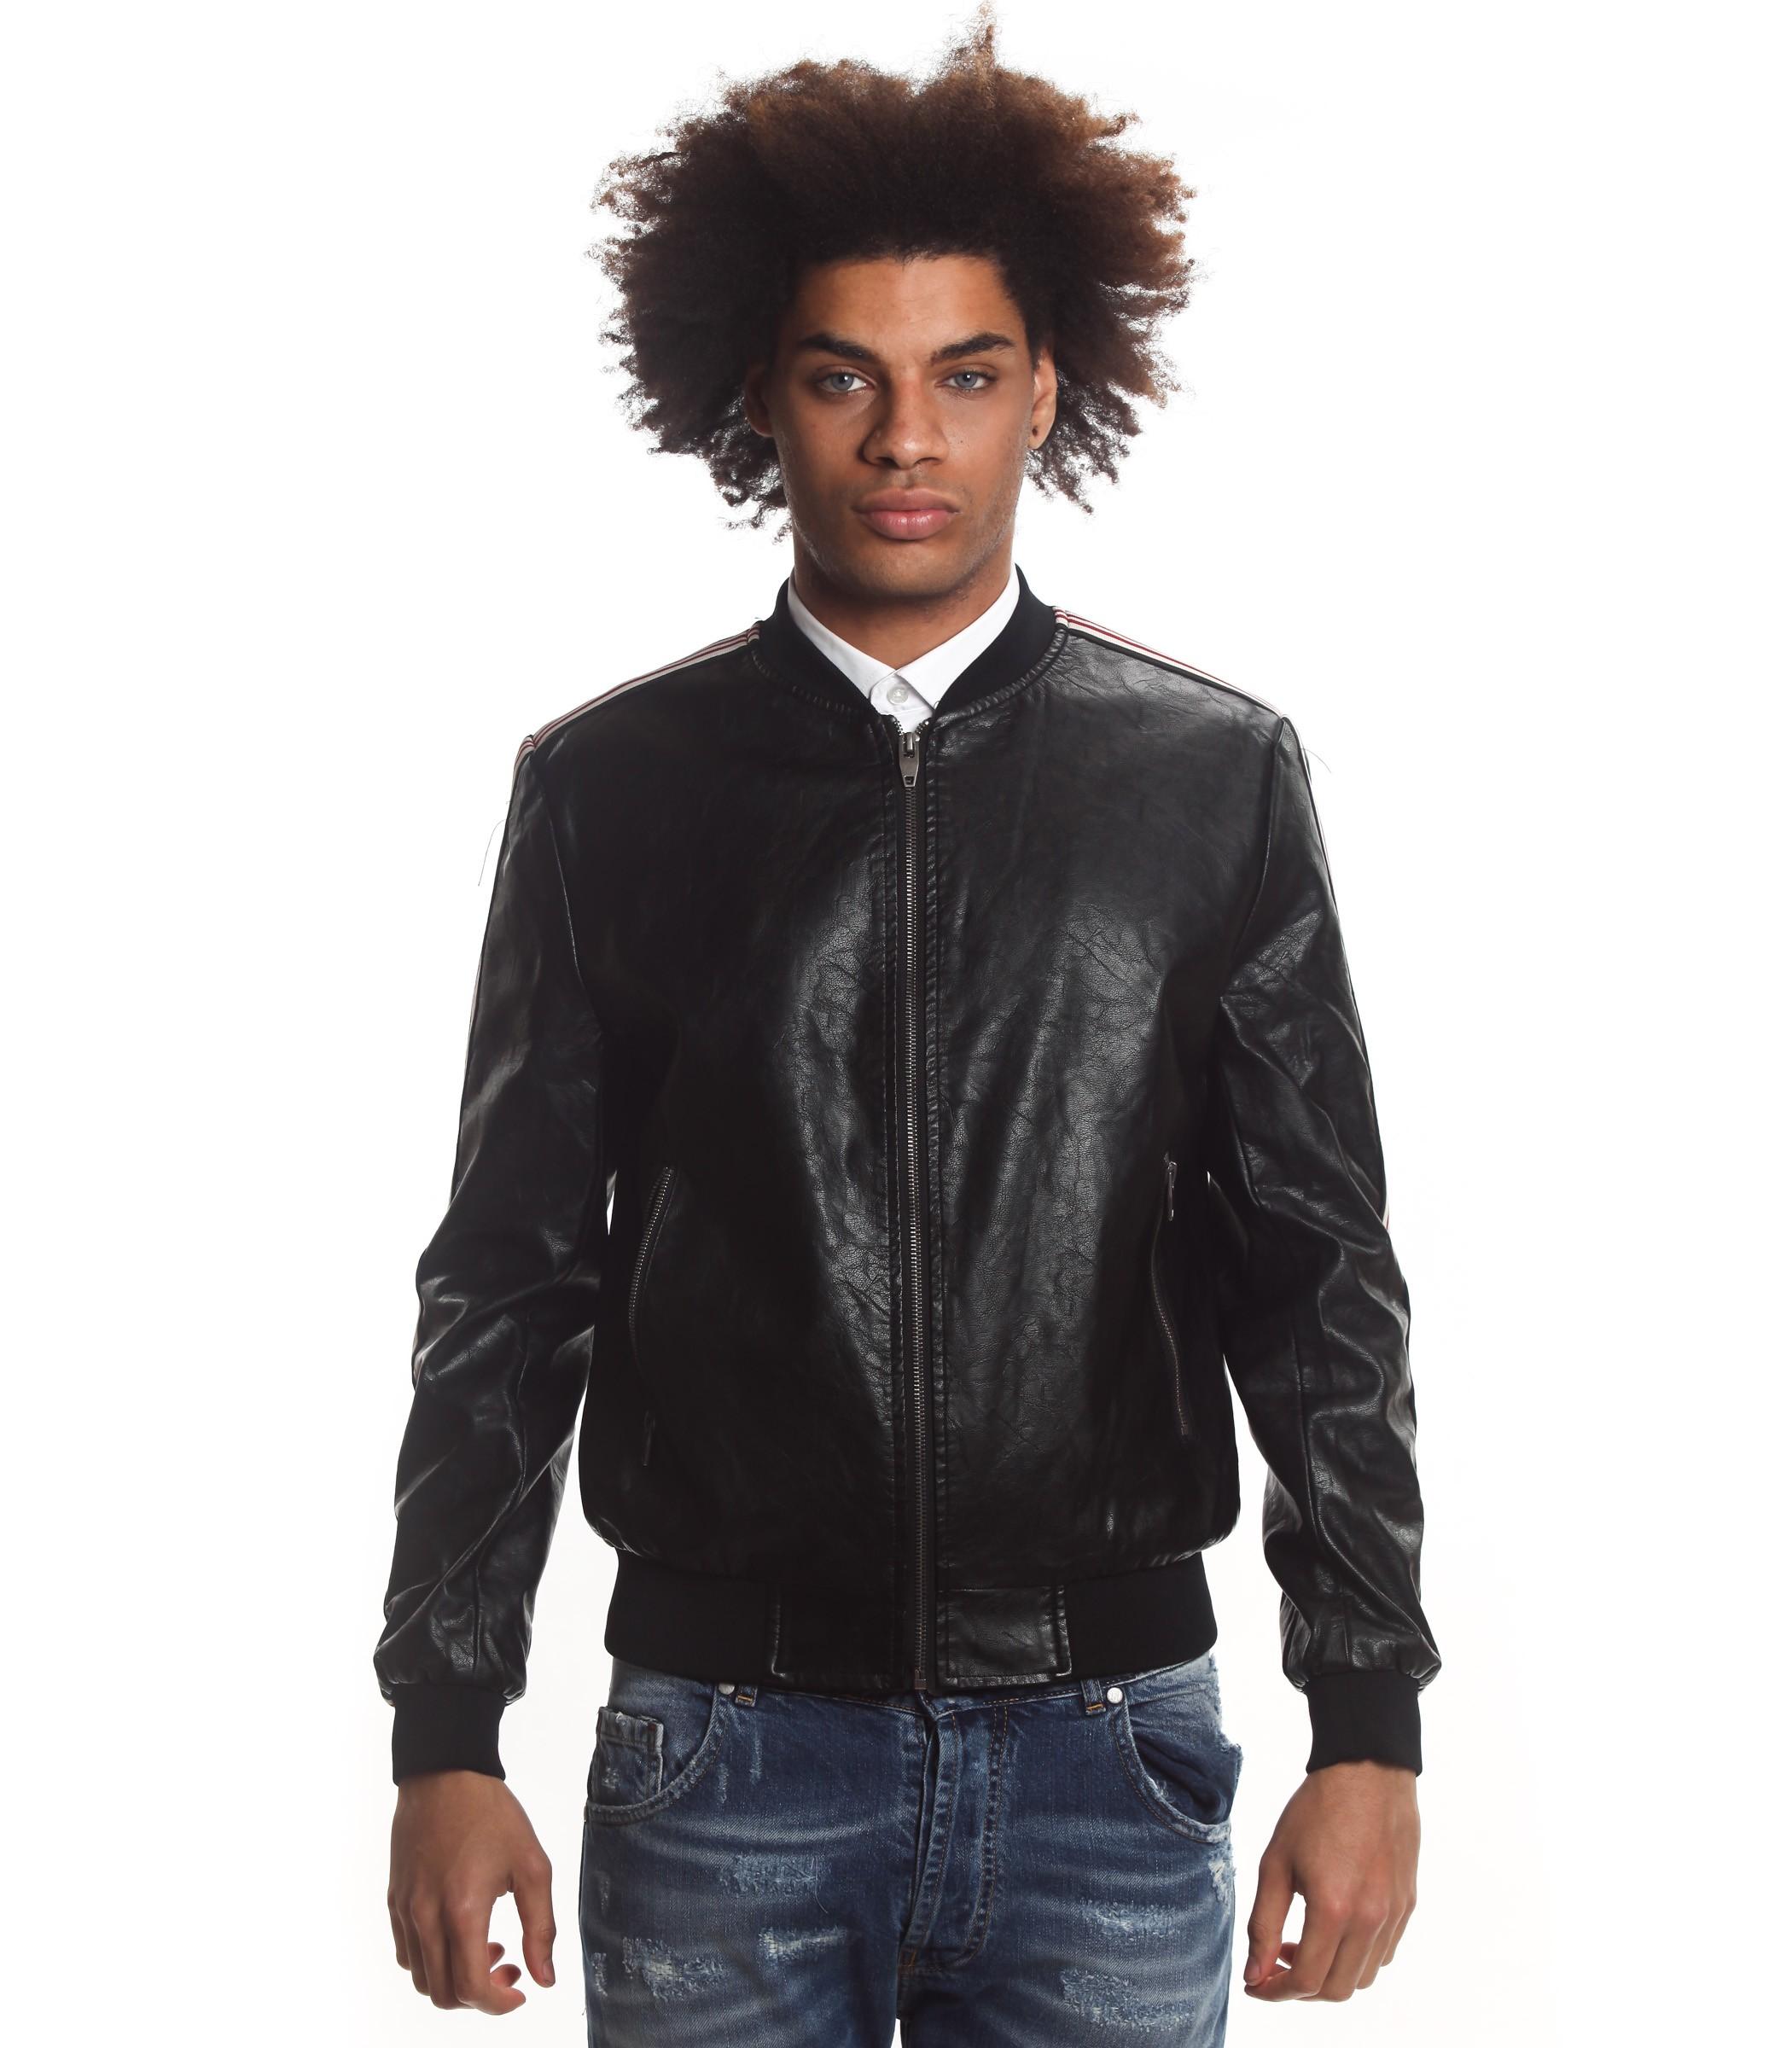 online store d3fba 584f5 Giubbotto Over-D giacca in ecopelle con bande laterali da ...